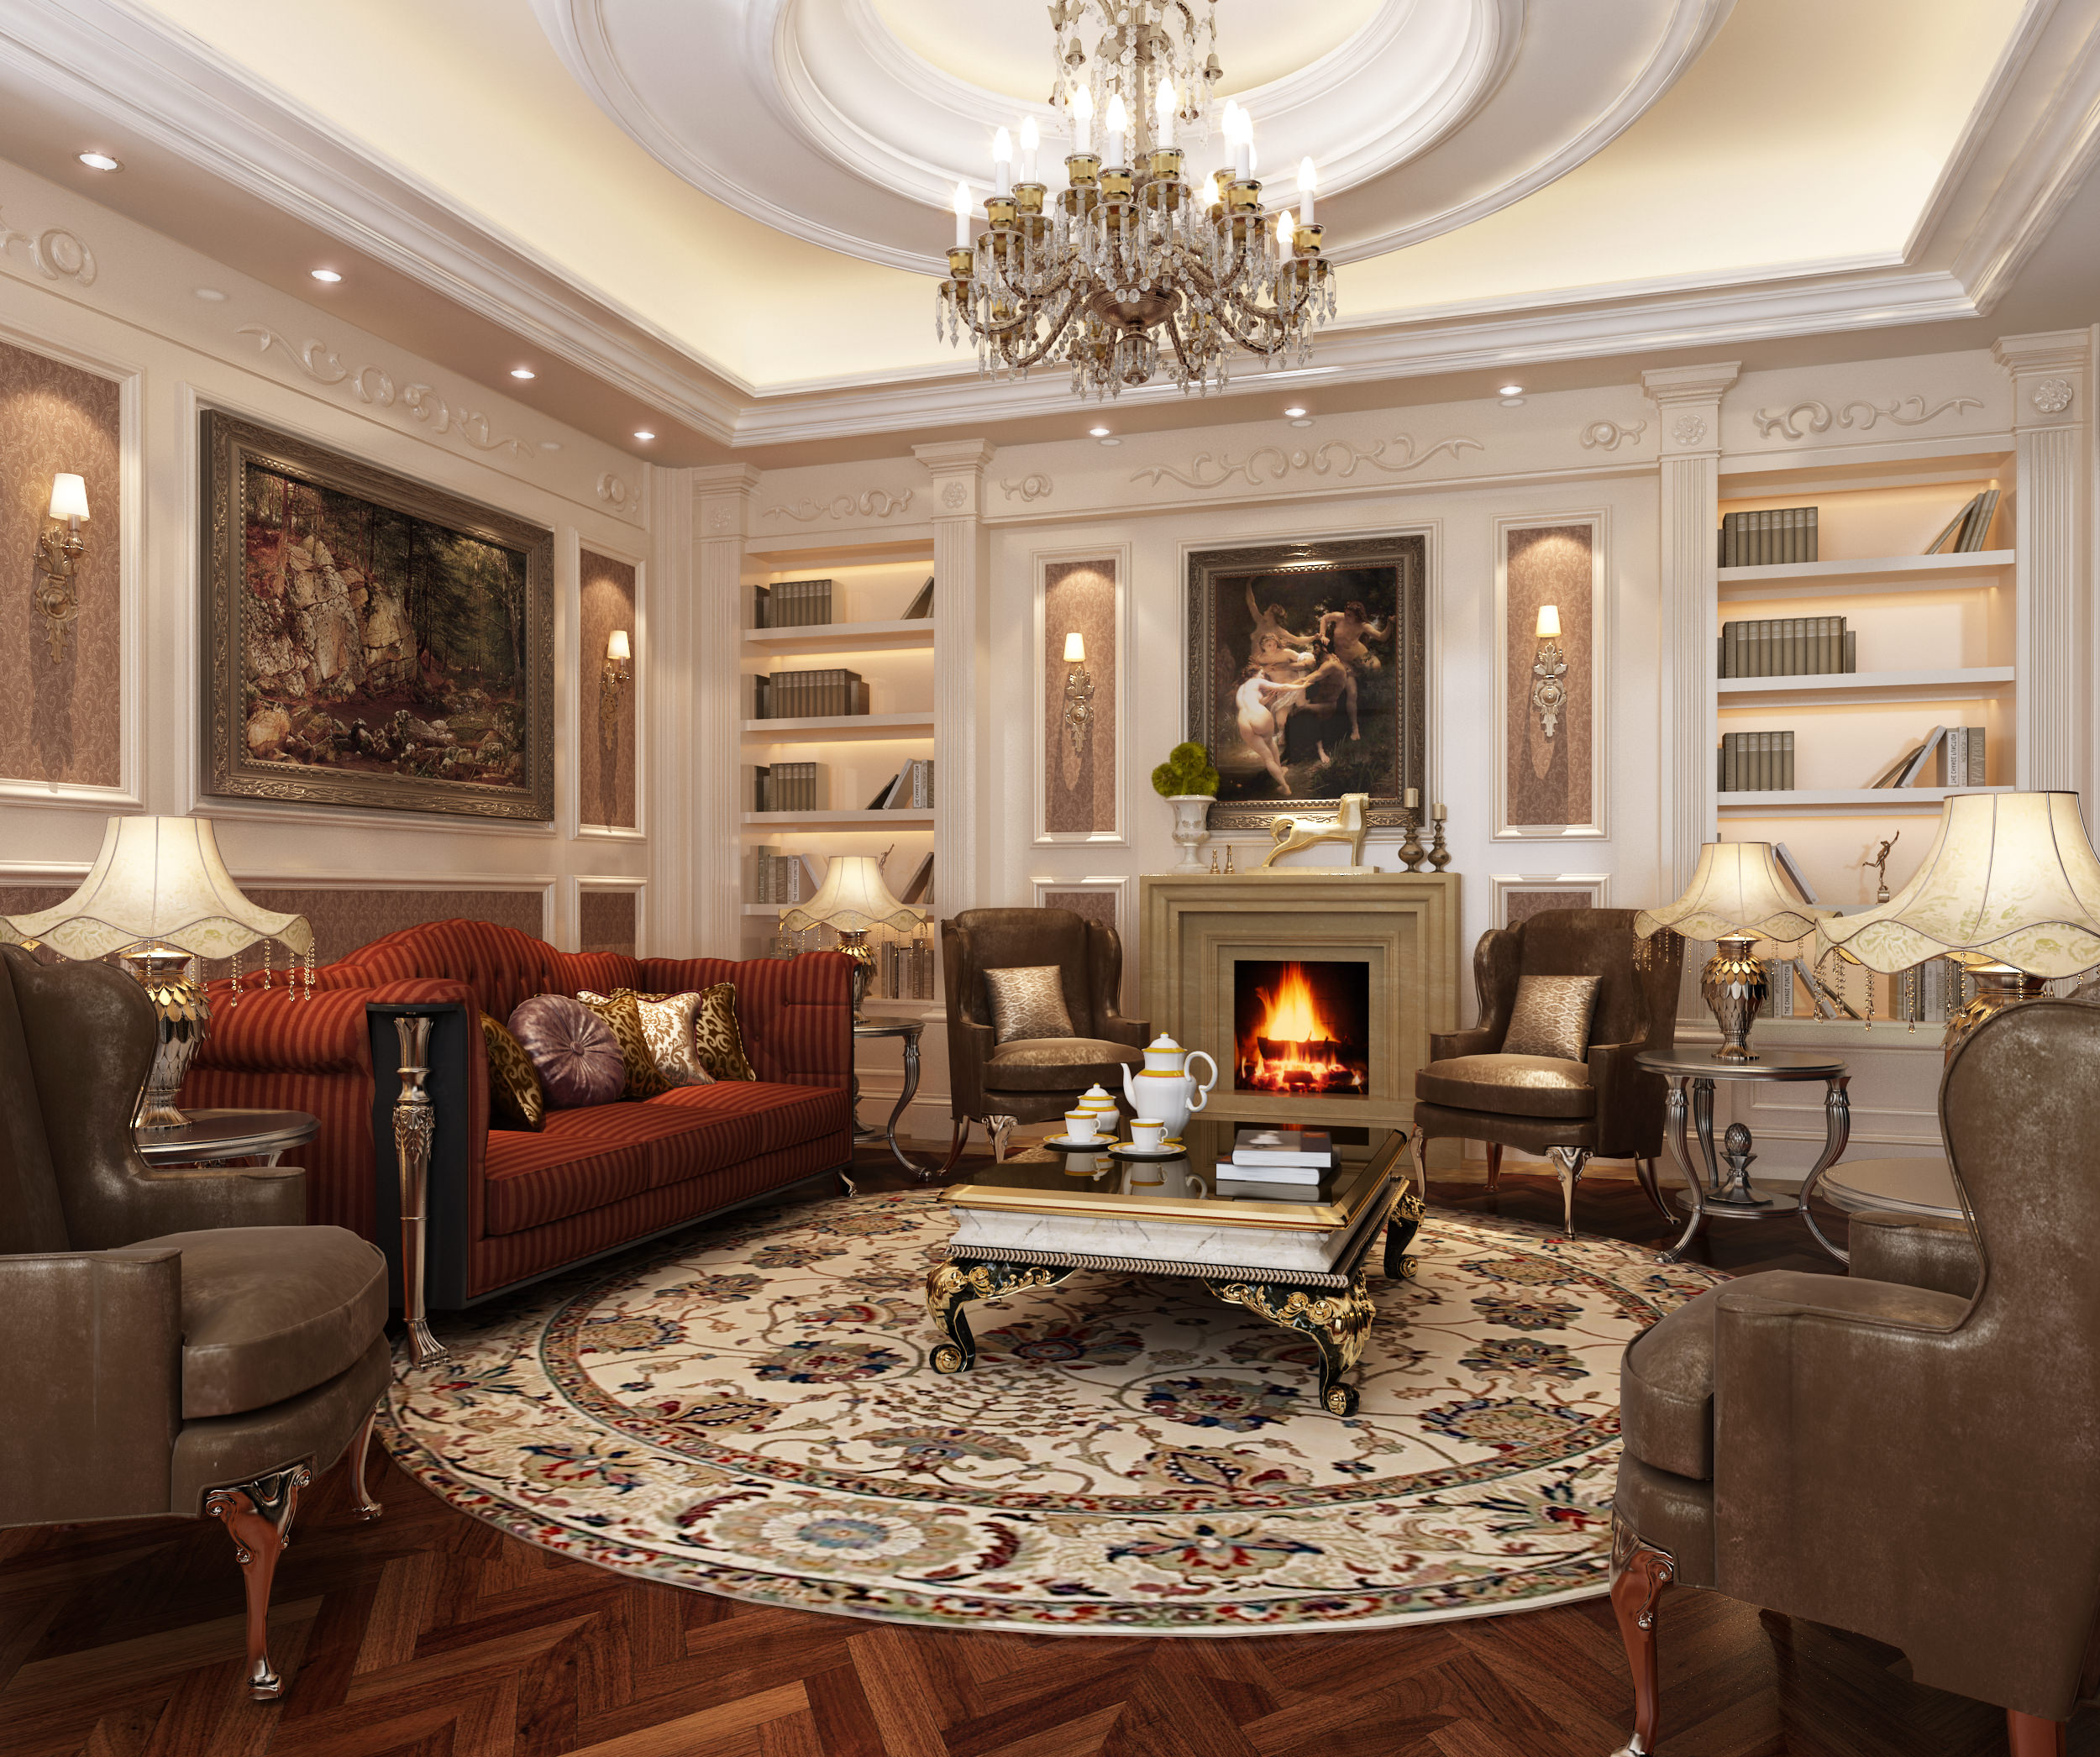 GİRİŞ KAT | SALON Classic-style-living-room-3d-model-max